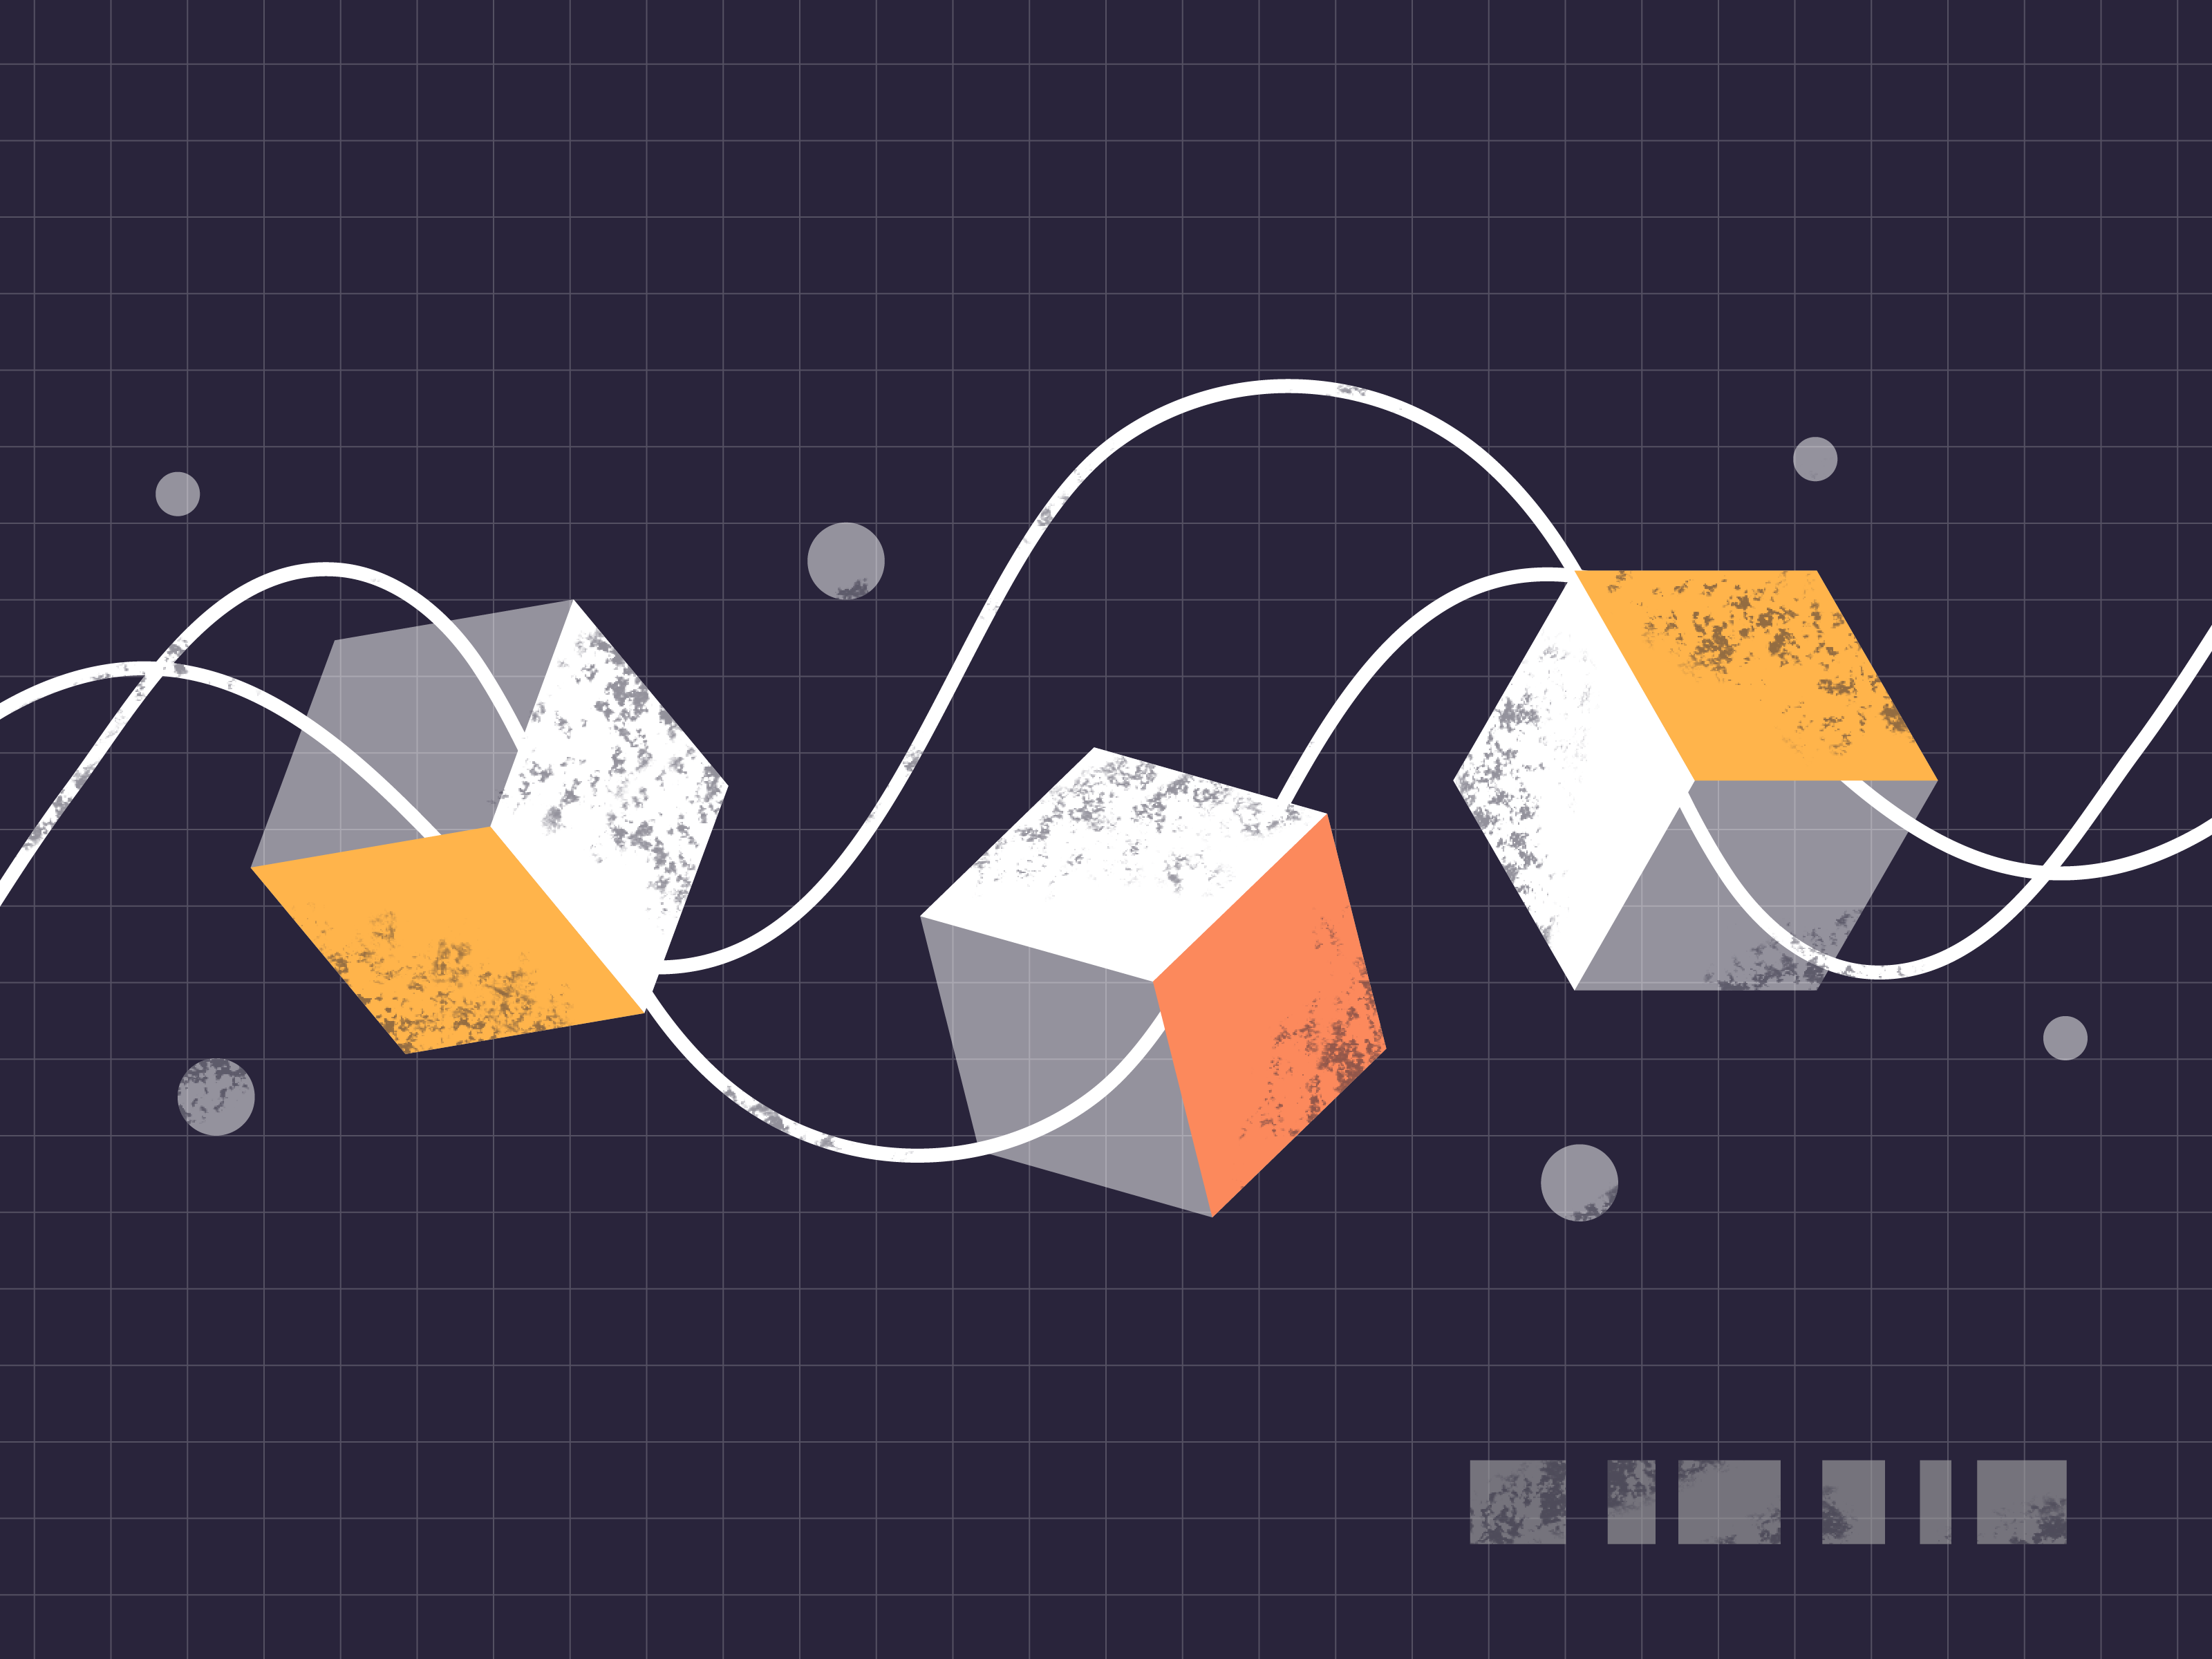 Block chain_2x